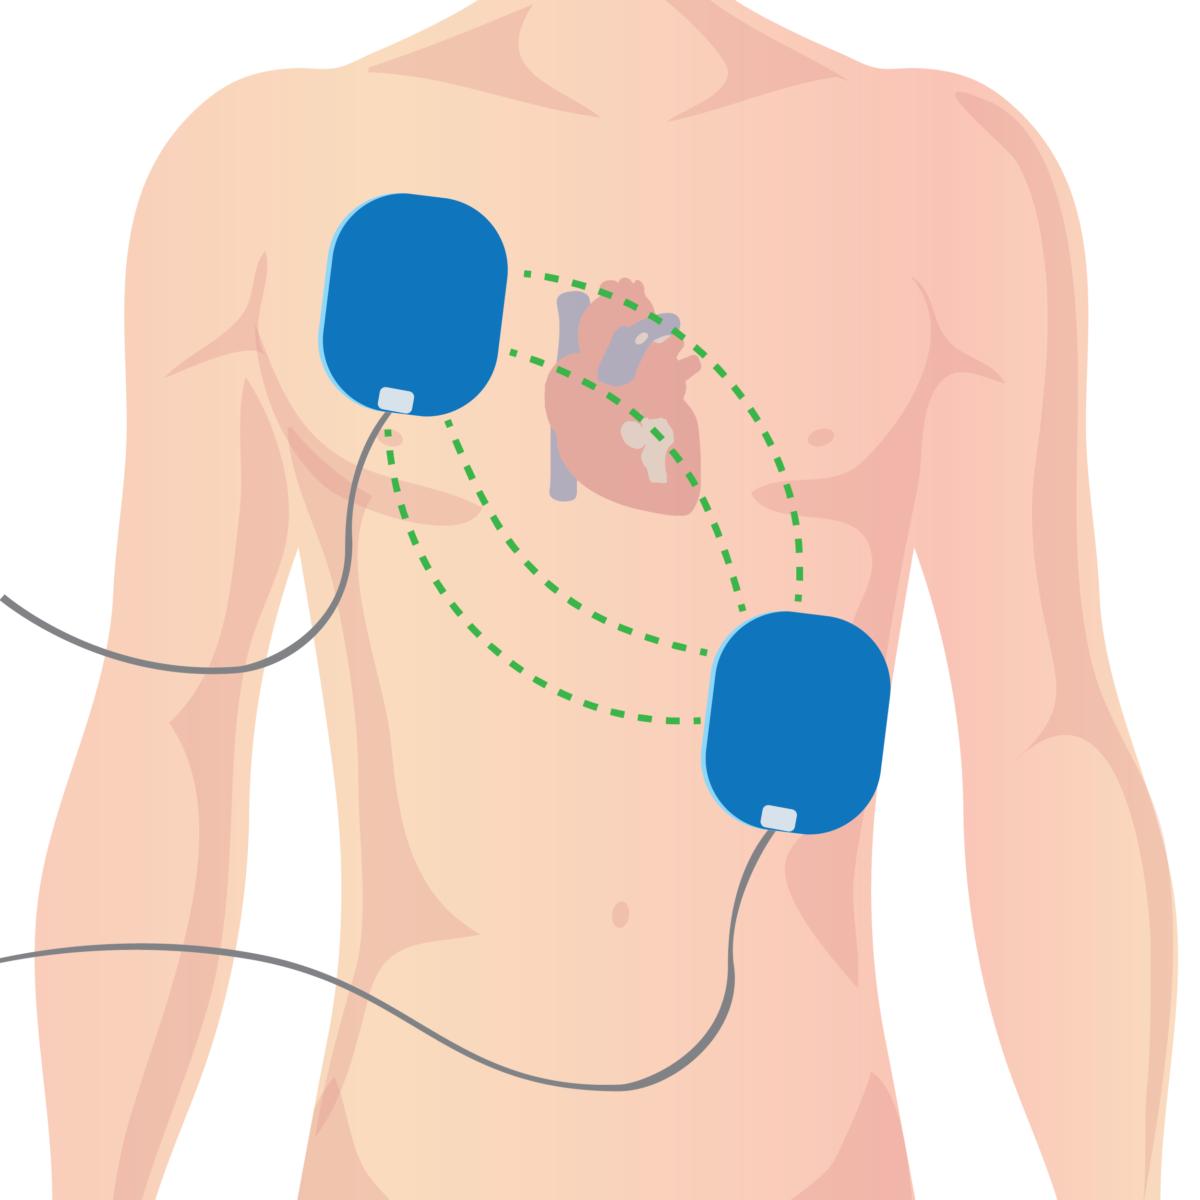 Defibrillator pad placement